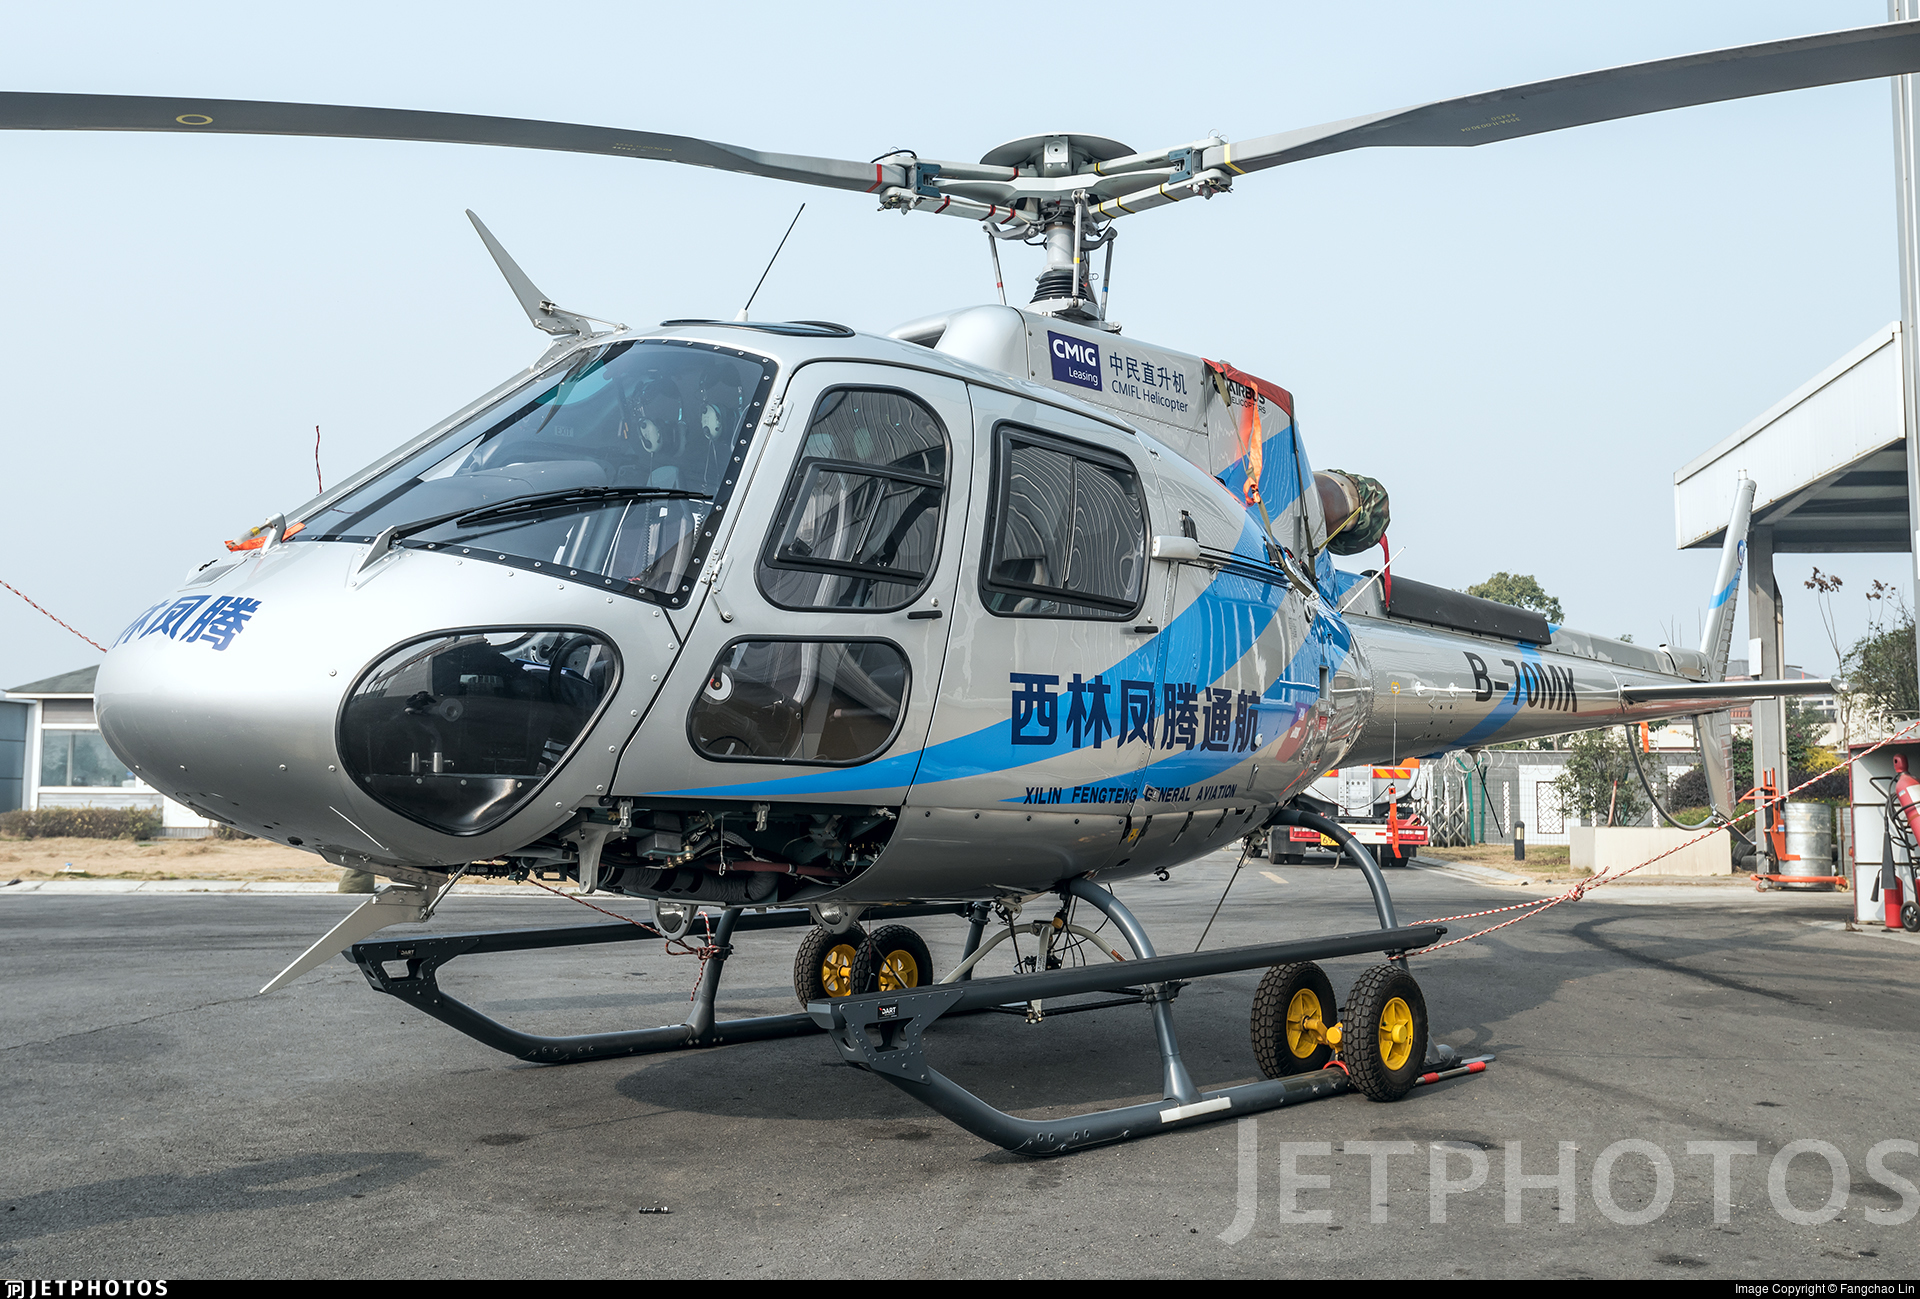 B-70MK - Eurocopter AS 350B3 Ecureuil - Sichuan Xiling Fengteng General Aviation